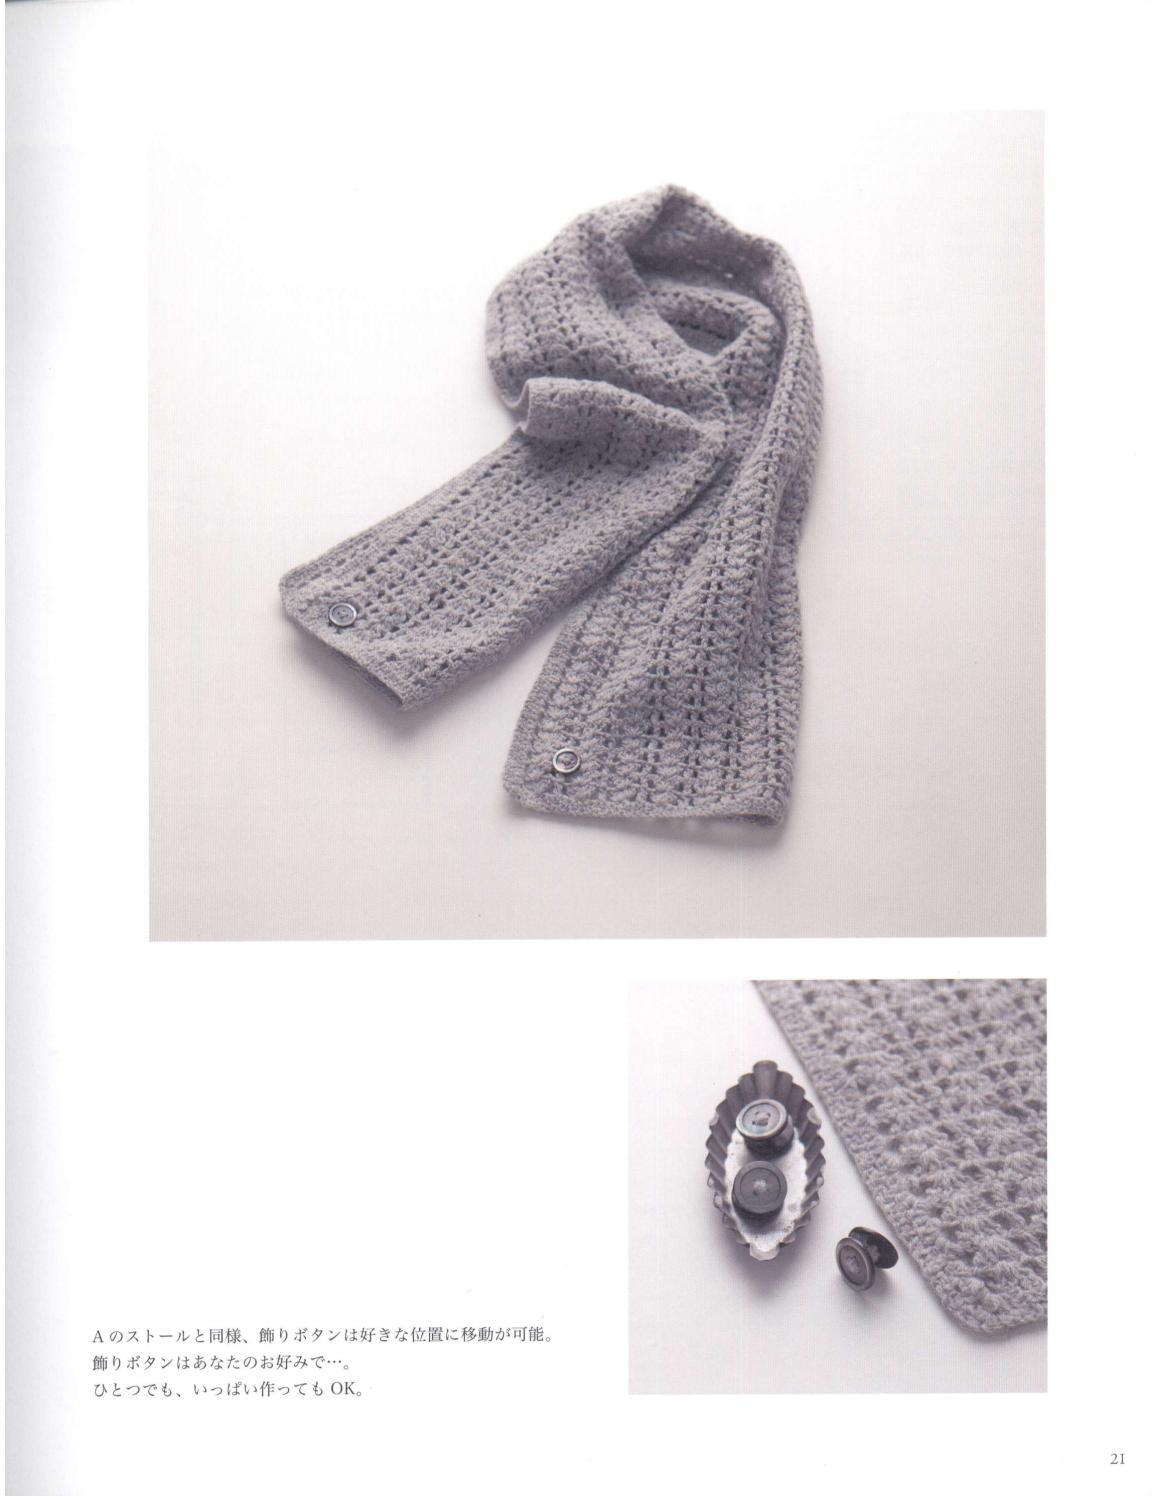 Asahi original crochet best selection 2012 page 21